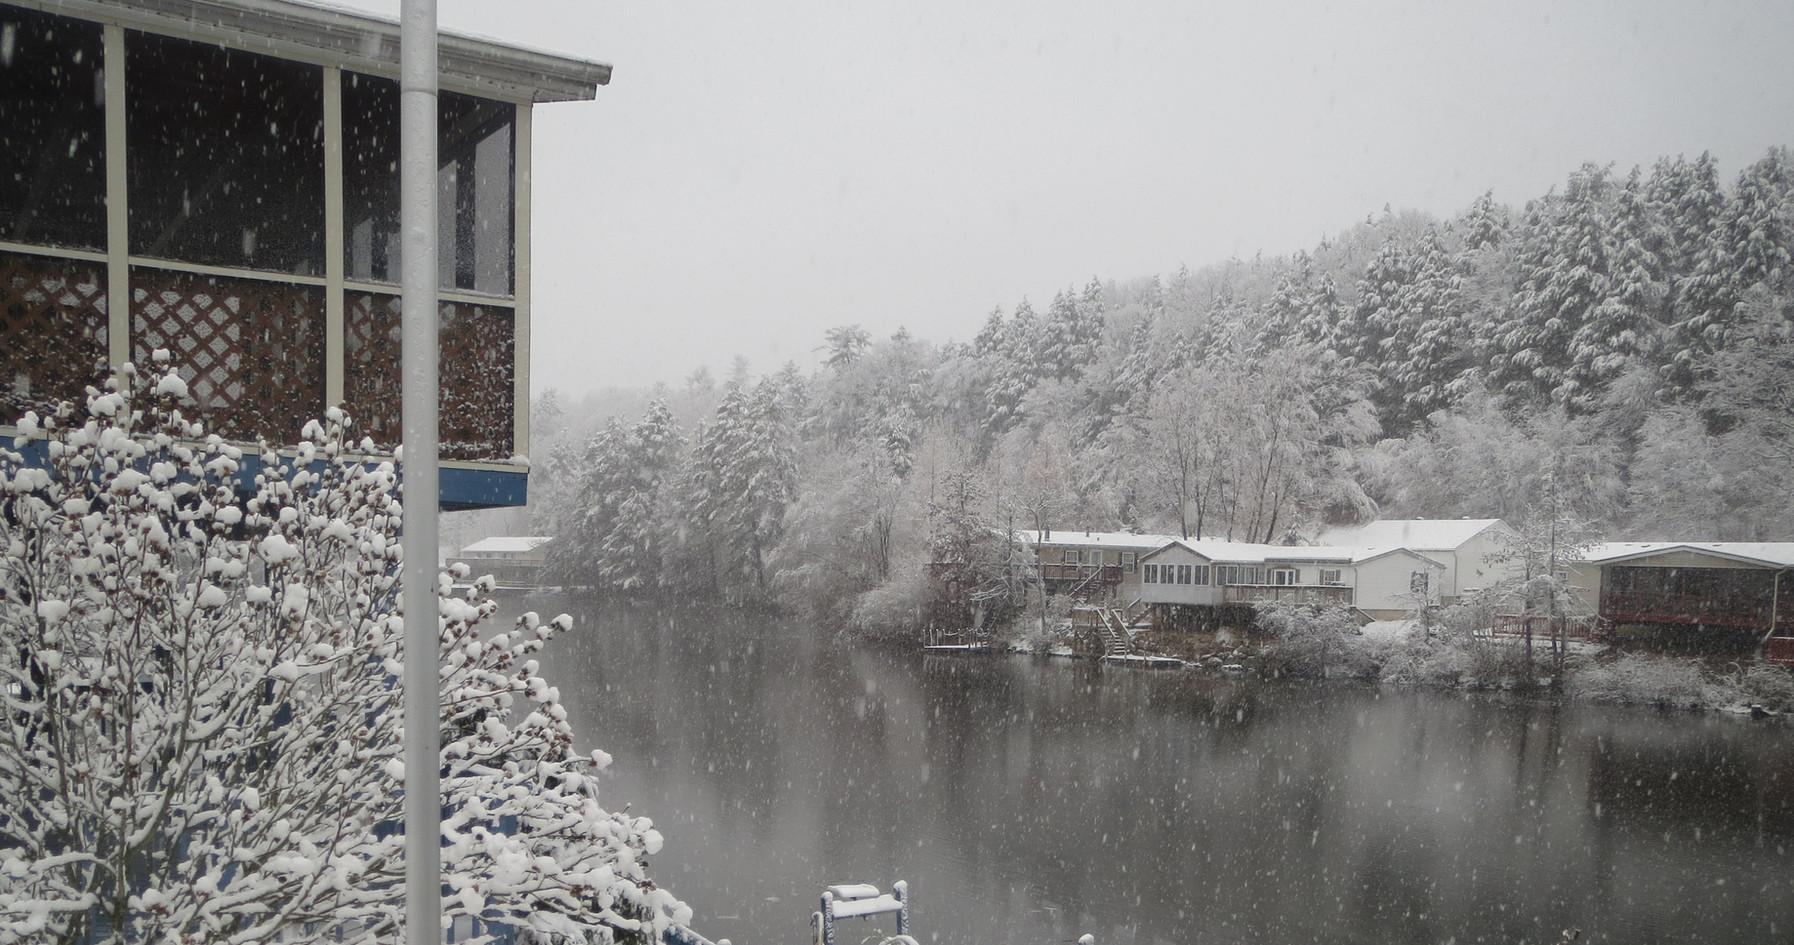 Winter at Blue Mountain Village